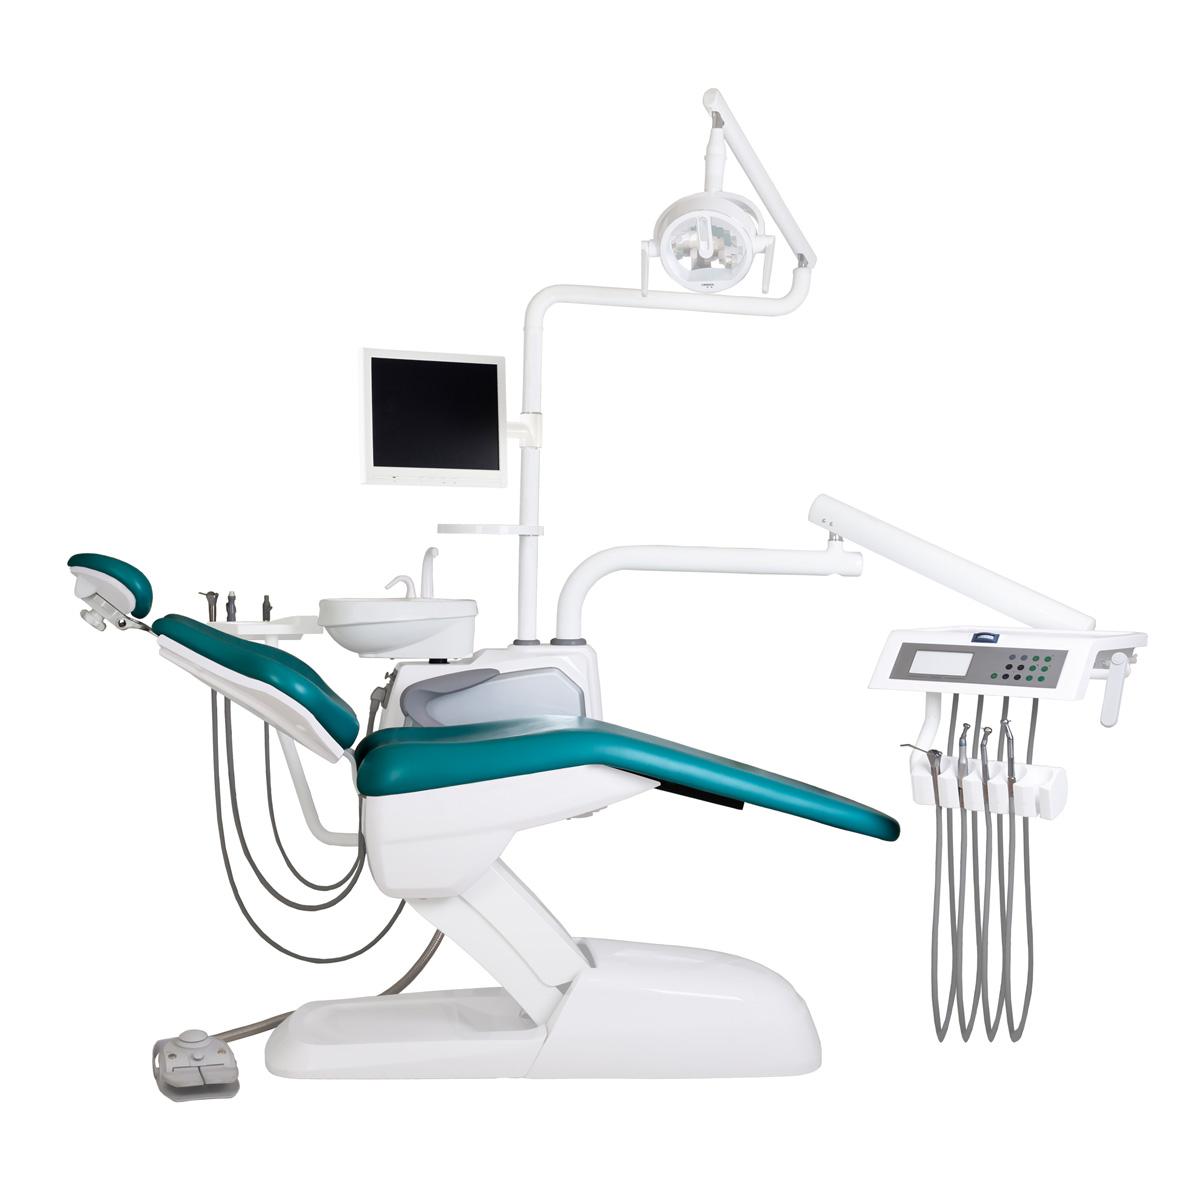 یونیت دندانپزشکی وصال گستر طب مدل ۱۲۰۰